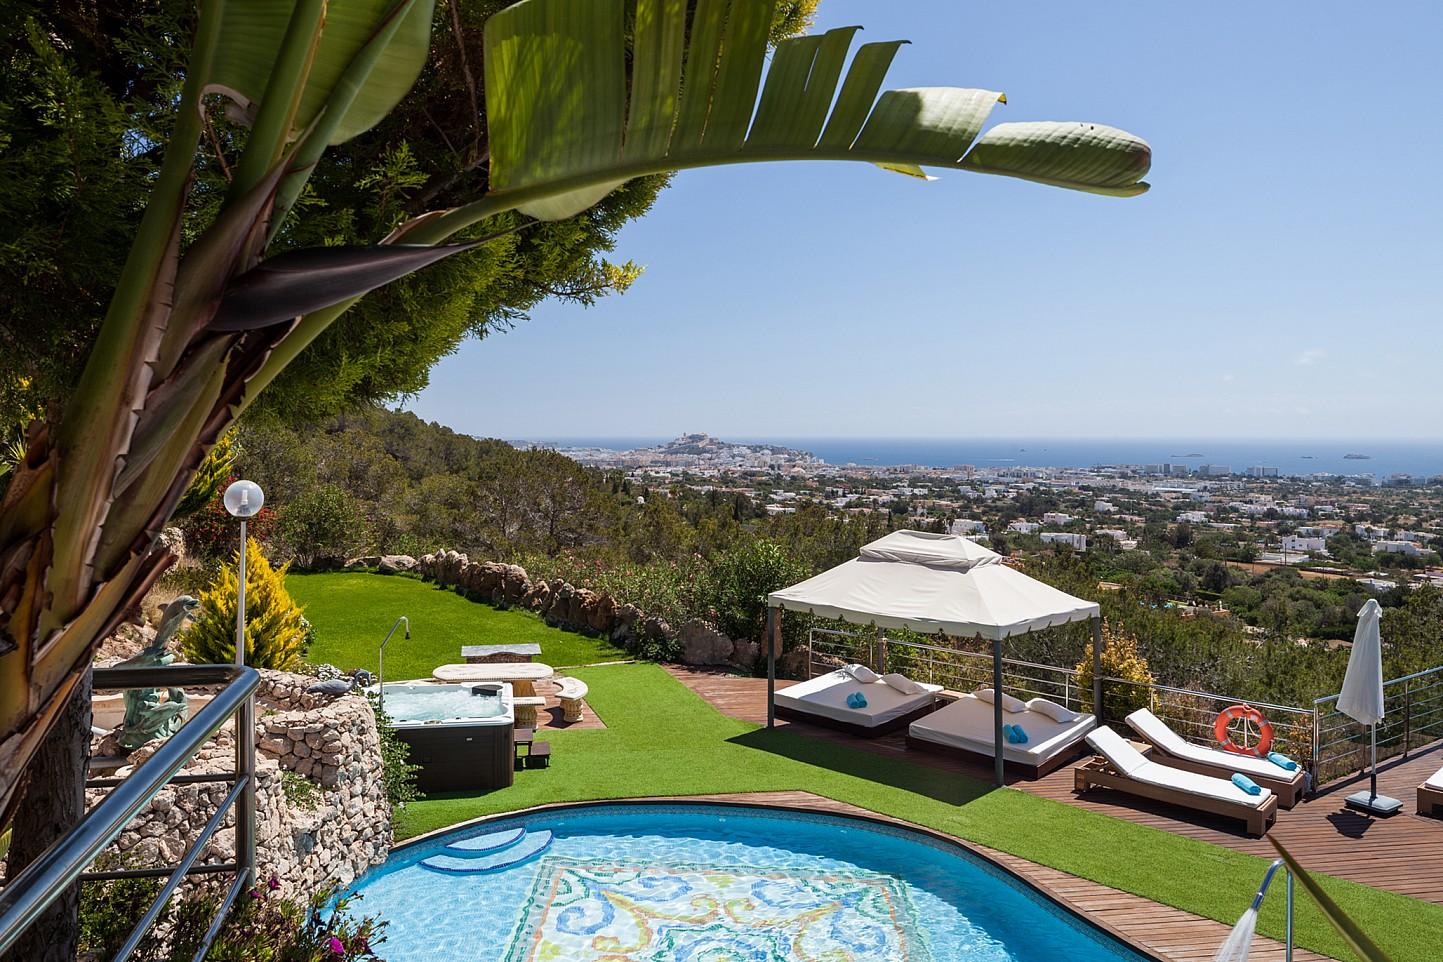 Потрясающая терраса виллы в аренду в Сан Хосе